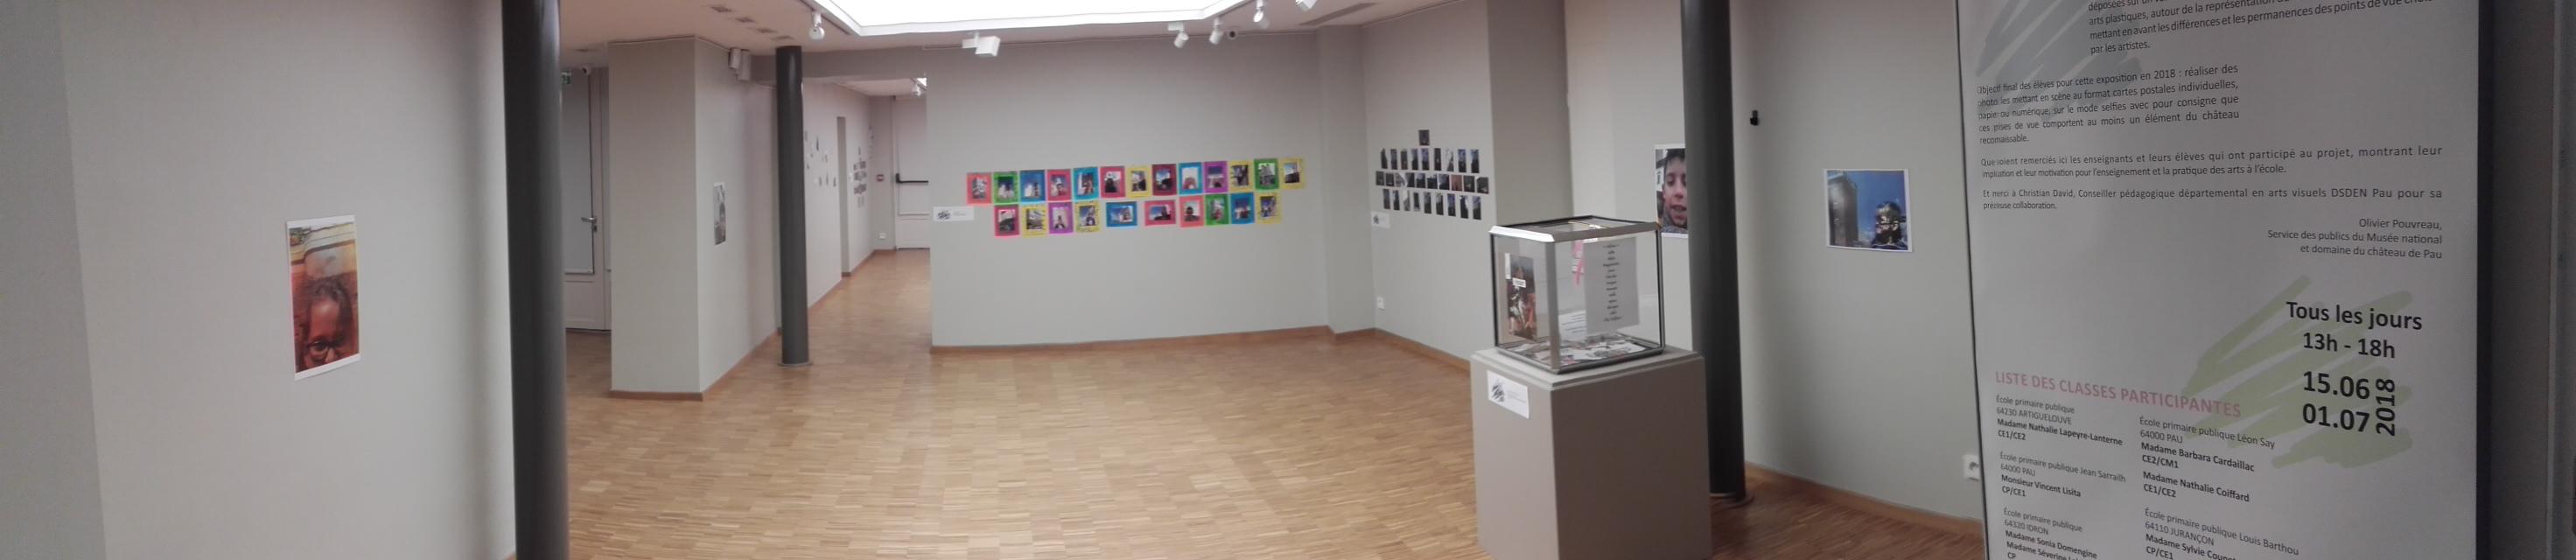 Salle d'exposition Maison Baylaucq